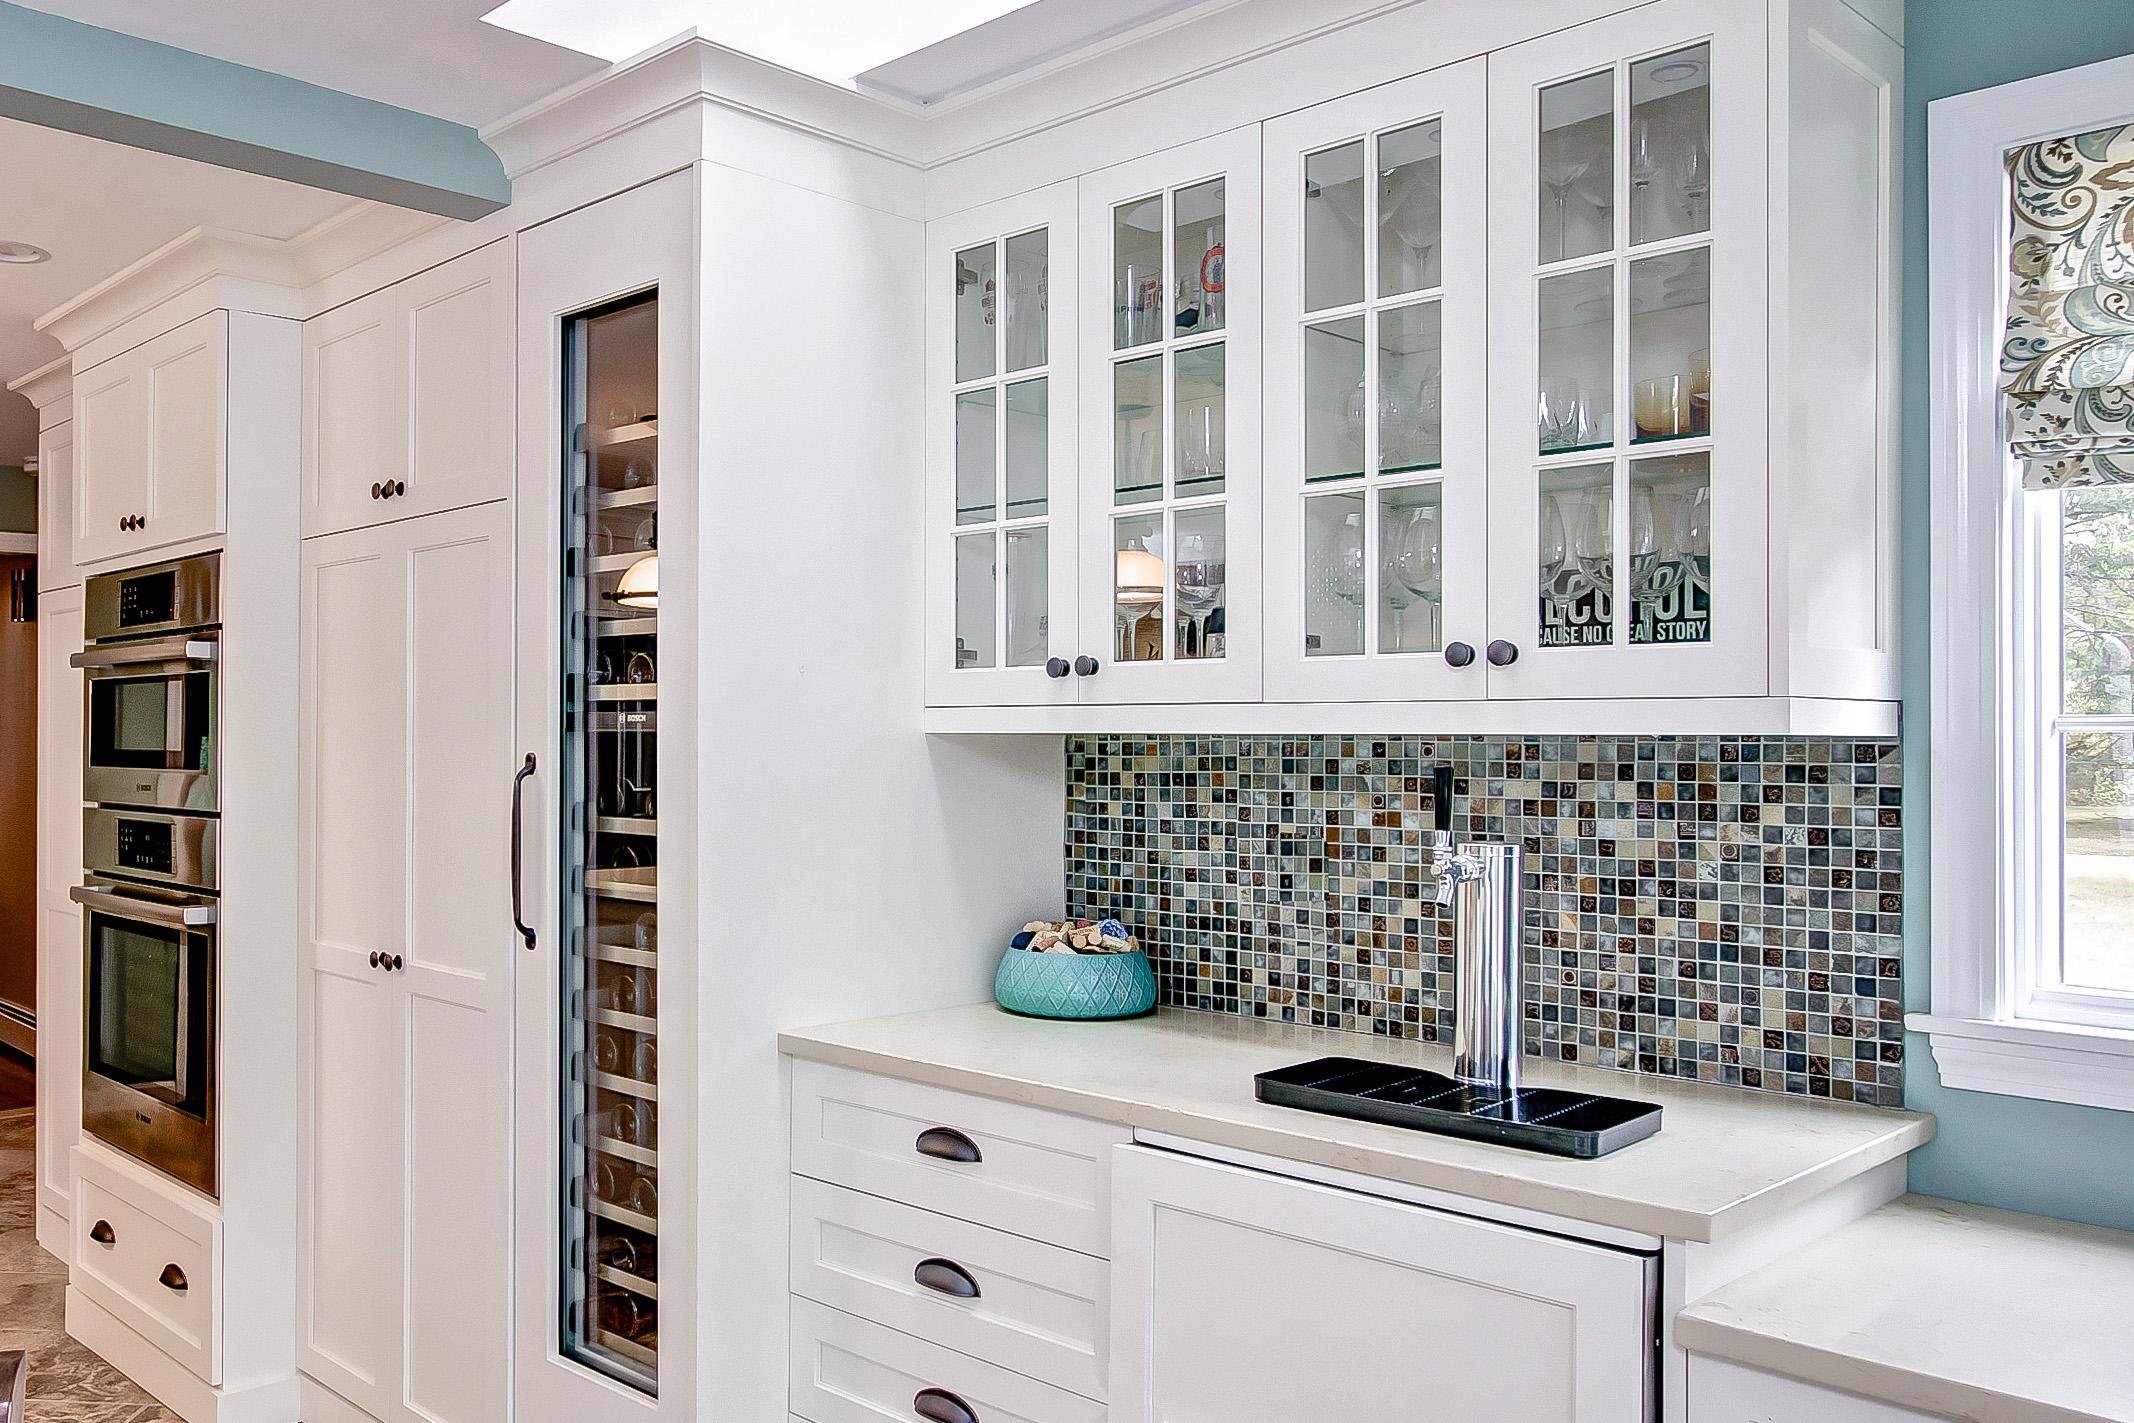 5-KitchenVisions-Bar-Wine-Kegerator-Sudbury.jpg